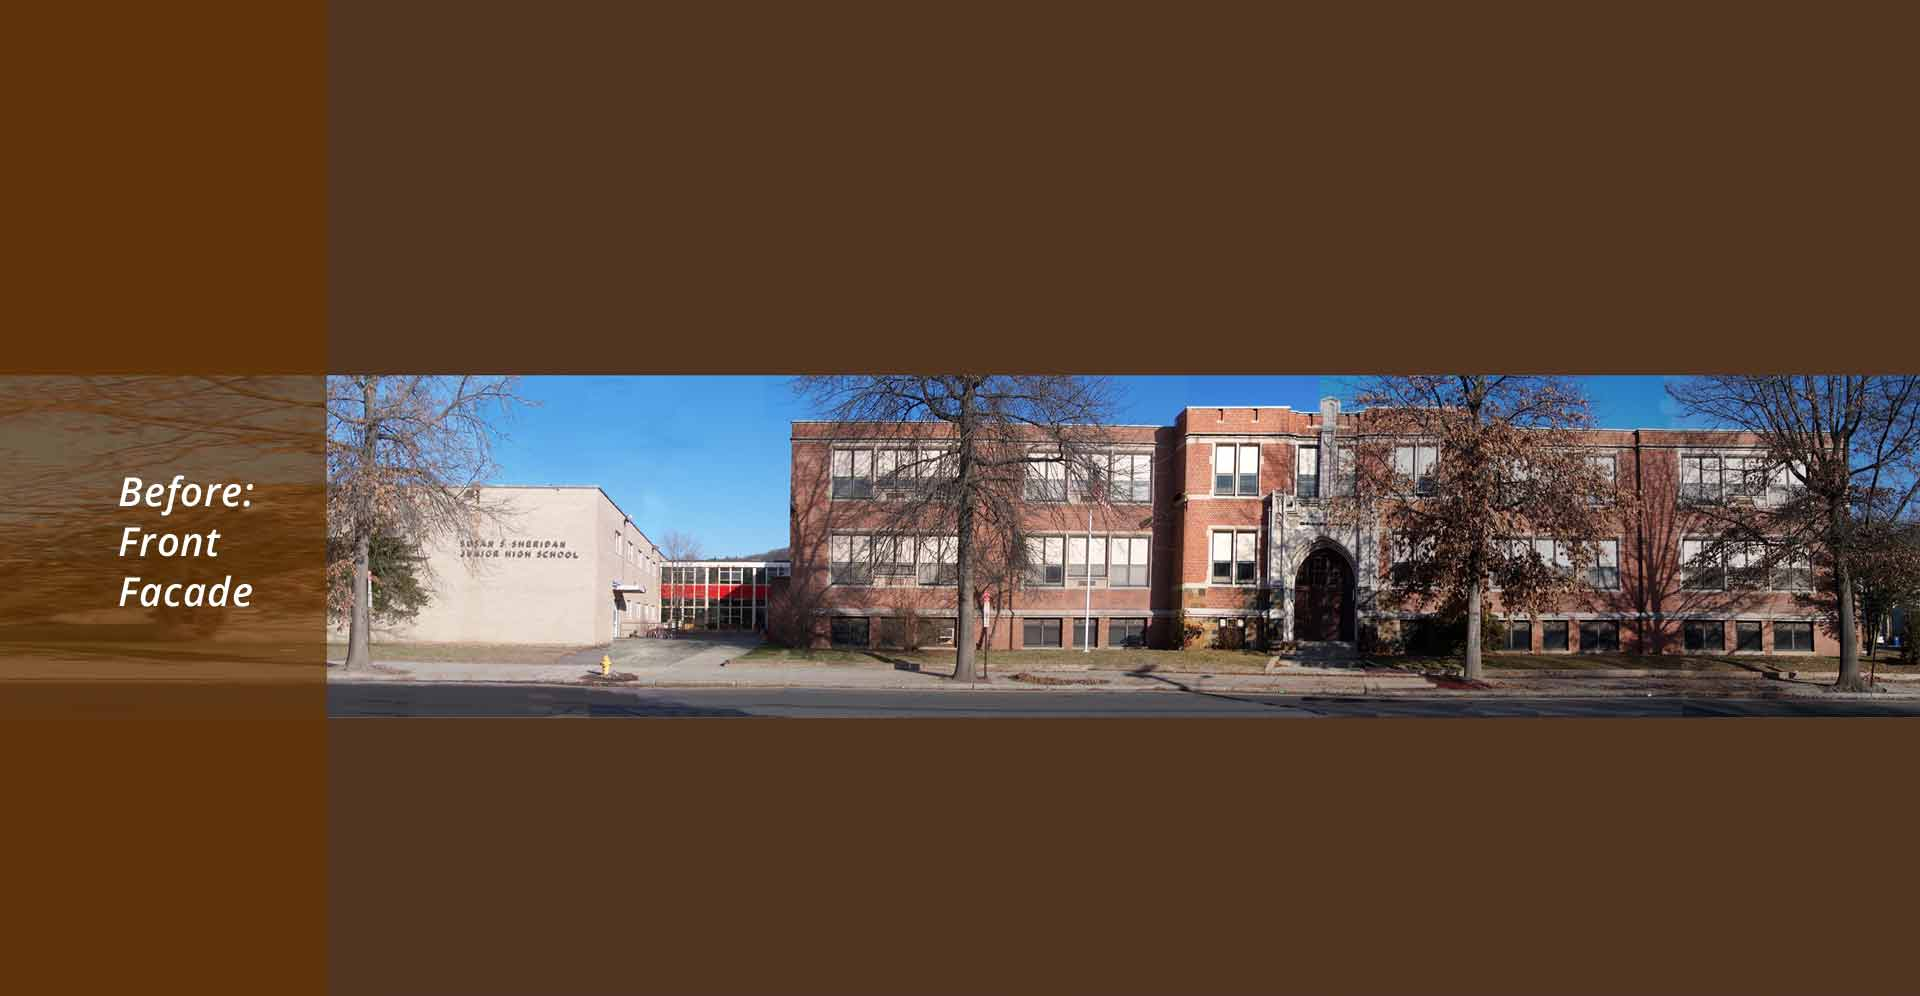 MAURO-SHERIDAN-SCHOOL-FRONT-BEFORE-1.jpg